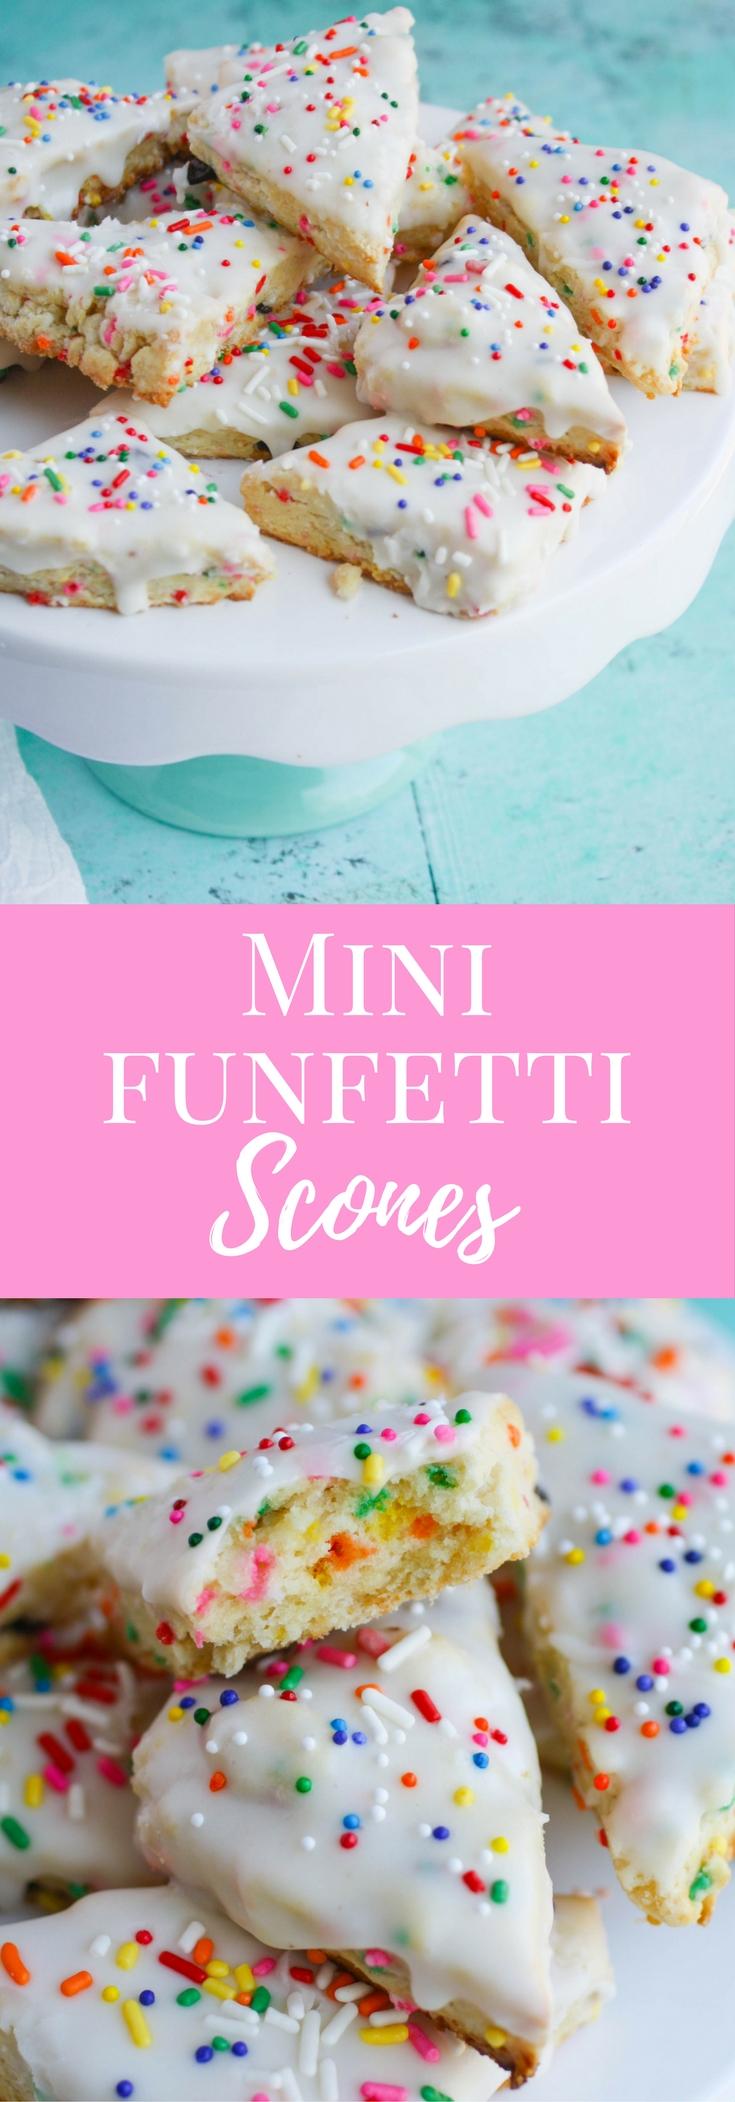 Mini Funfetti Scones are super fun for any occasion! This dessert is also perfect for a breakfast treat!